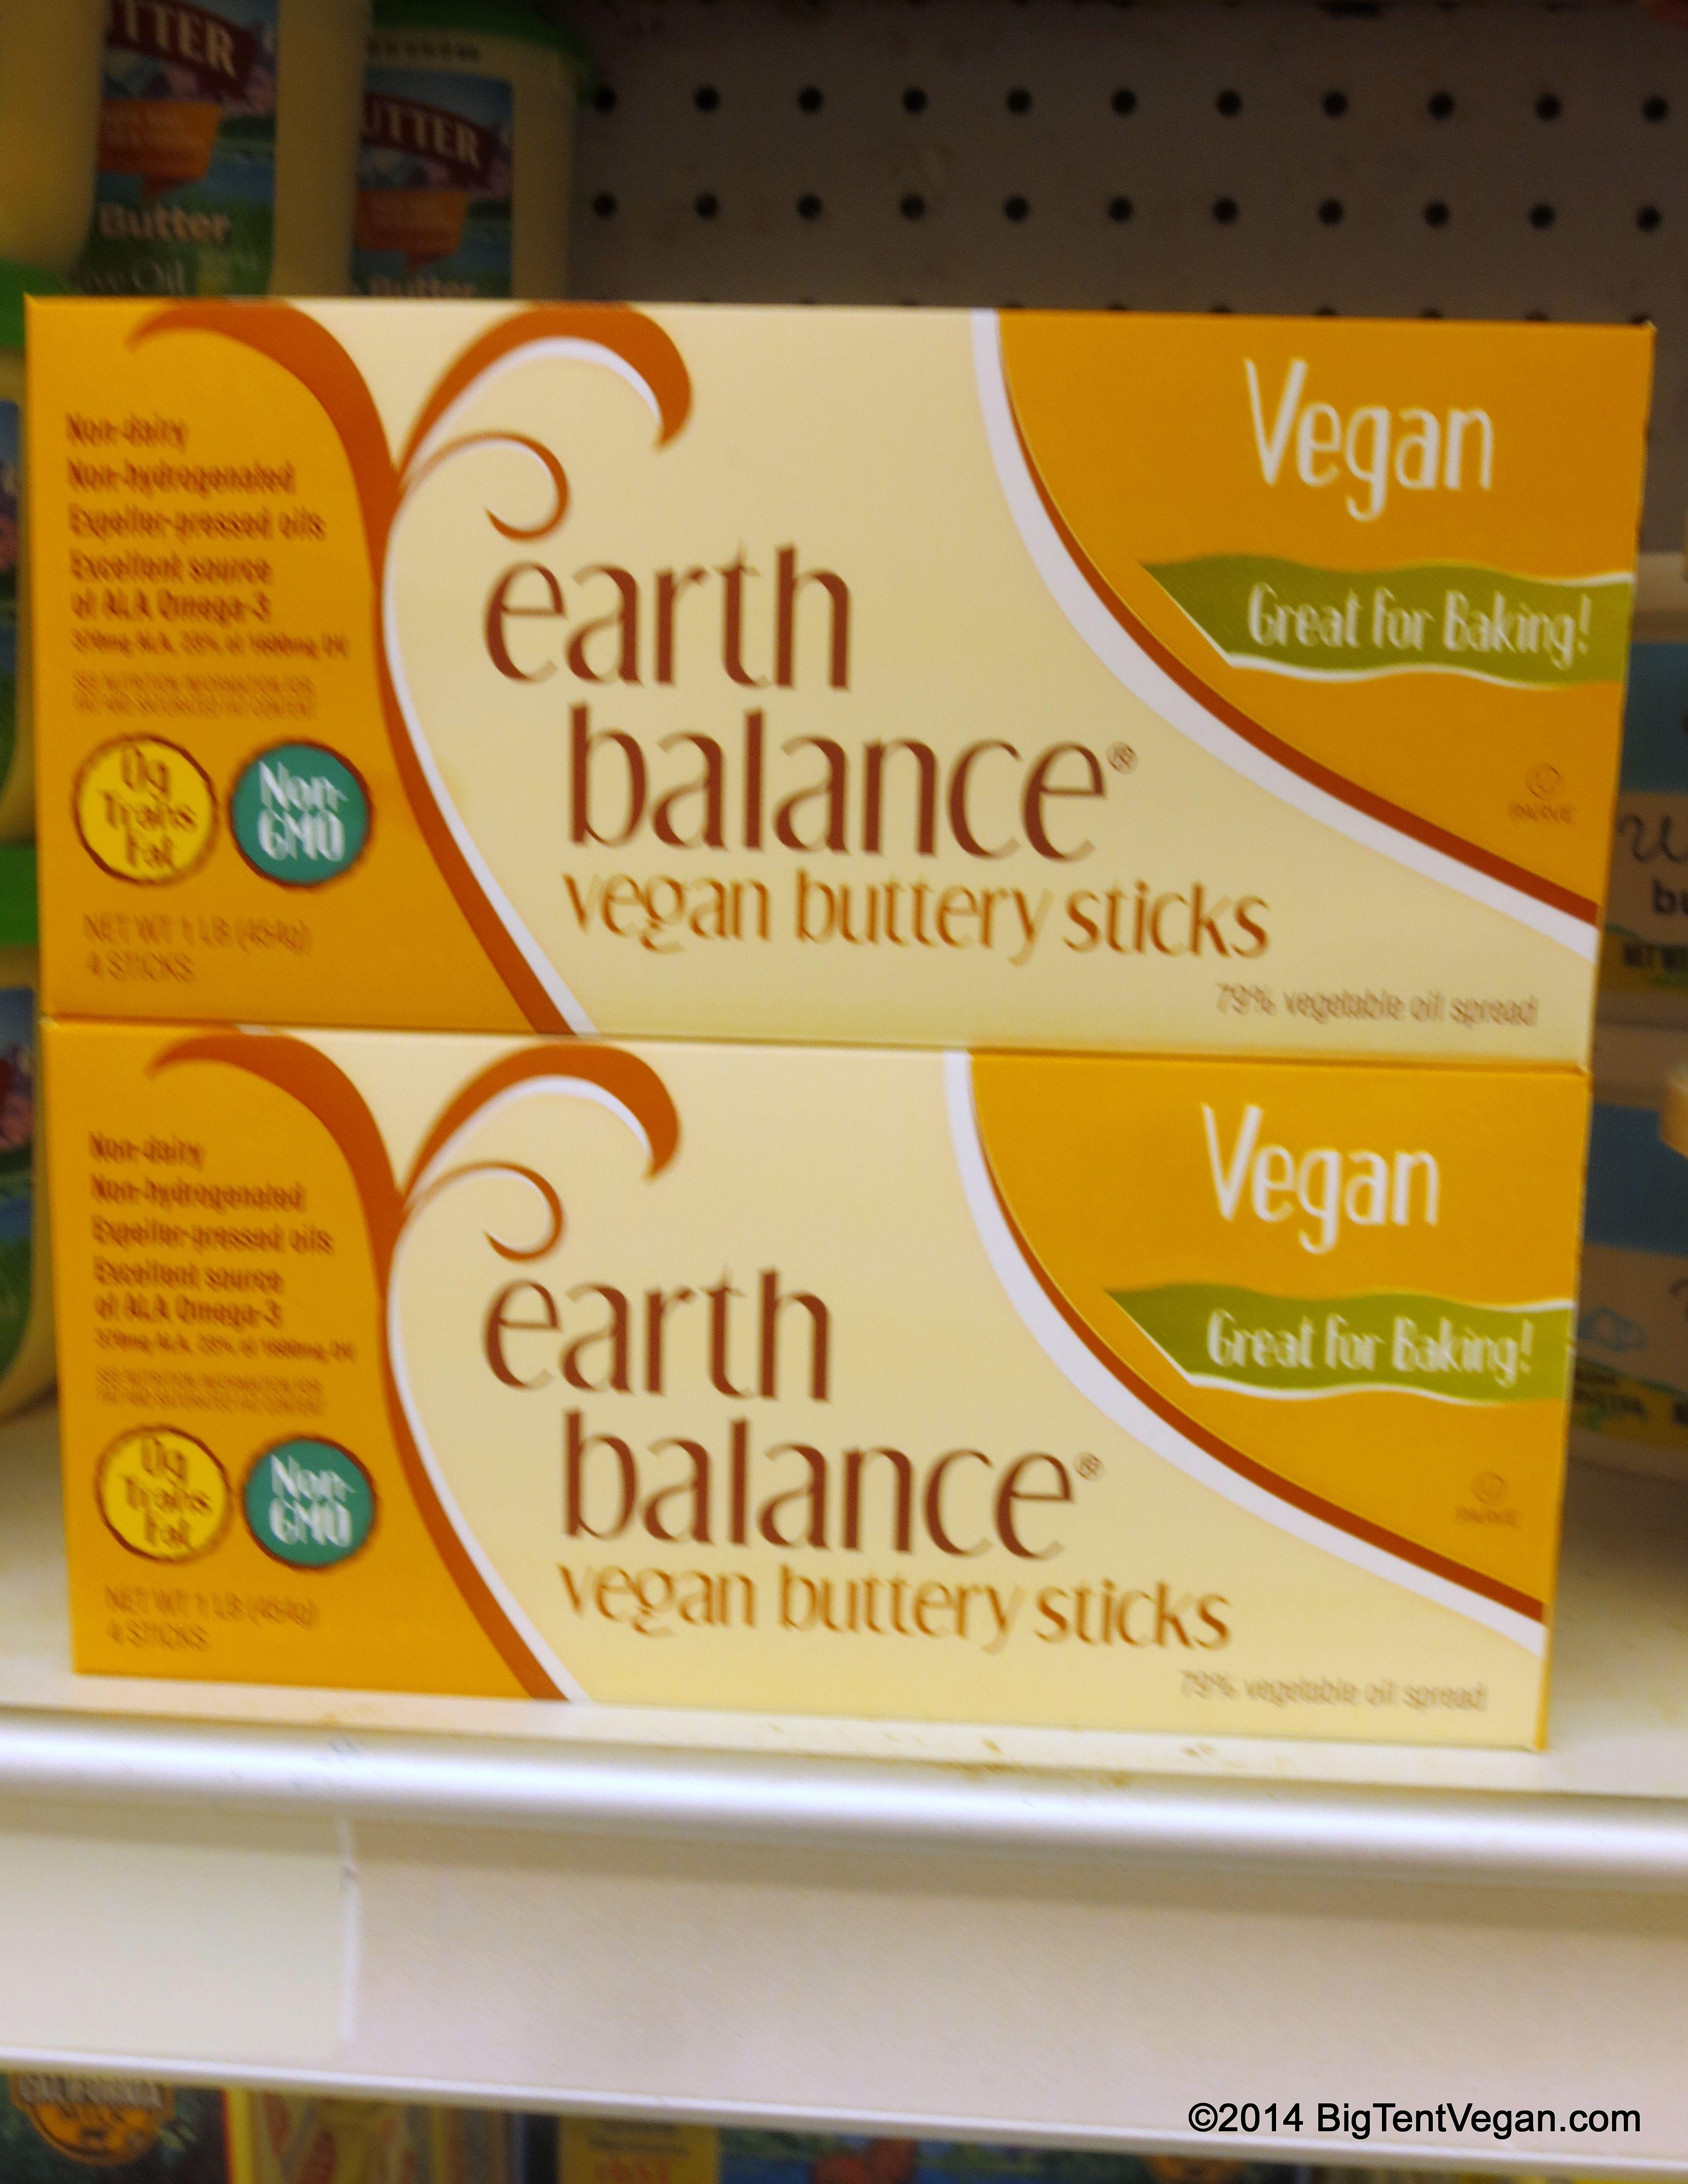 Earth Balance Vegan Butter Package Of 4 Sticks Vegan Whole Food Recipes Vegan Vegan Butter